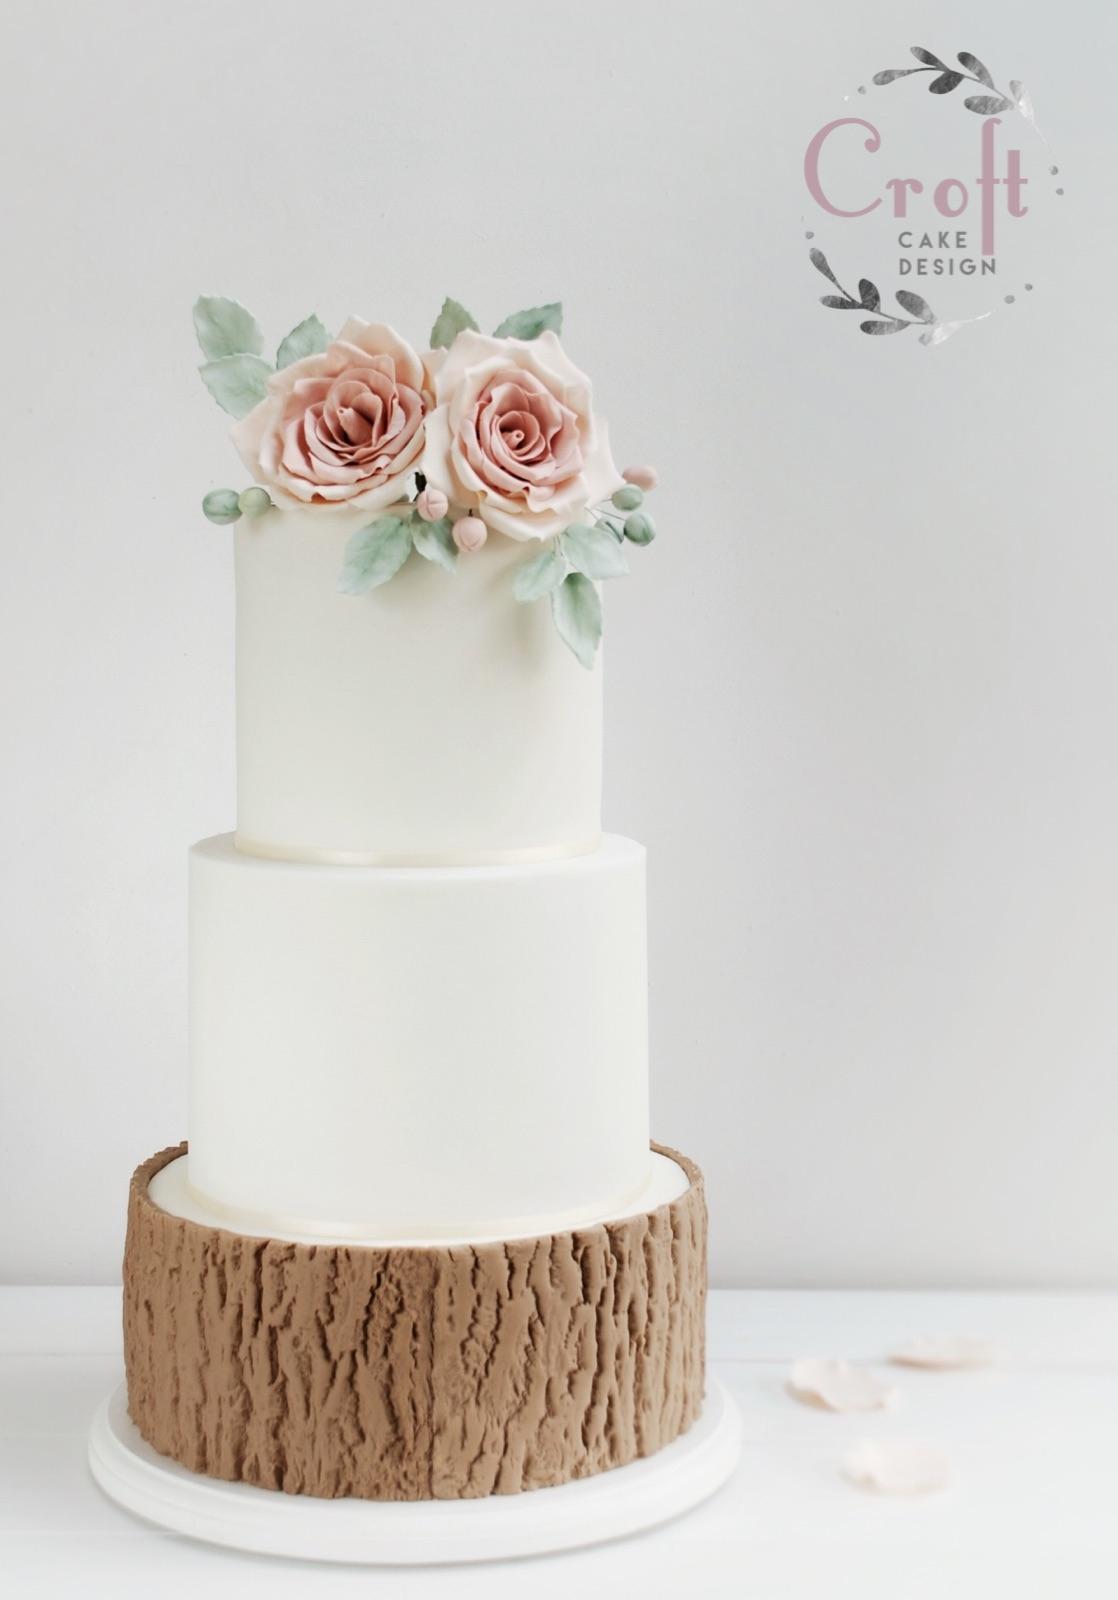 3 tier wedding cake with sugar flowers